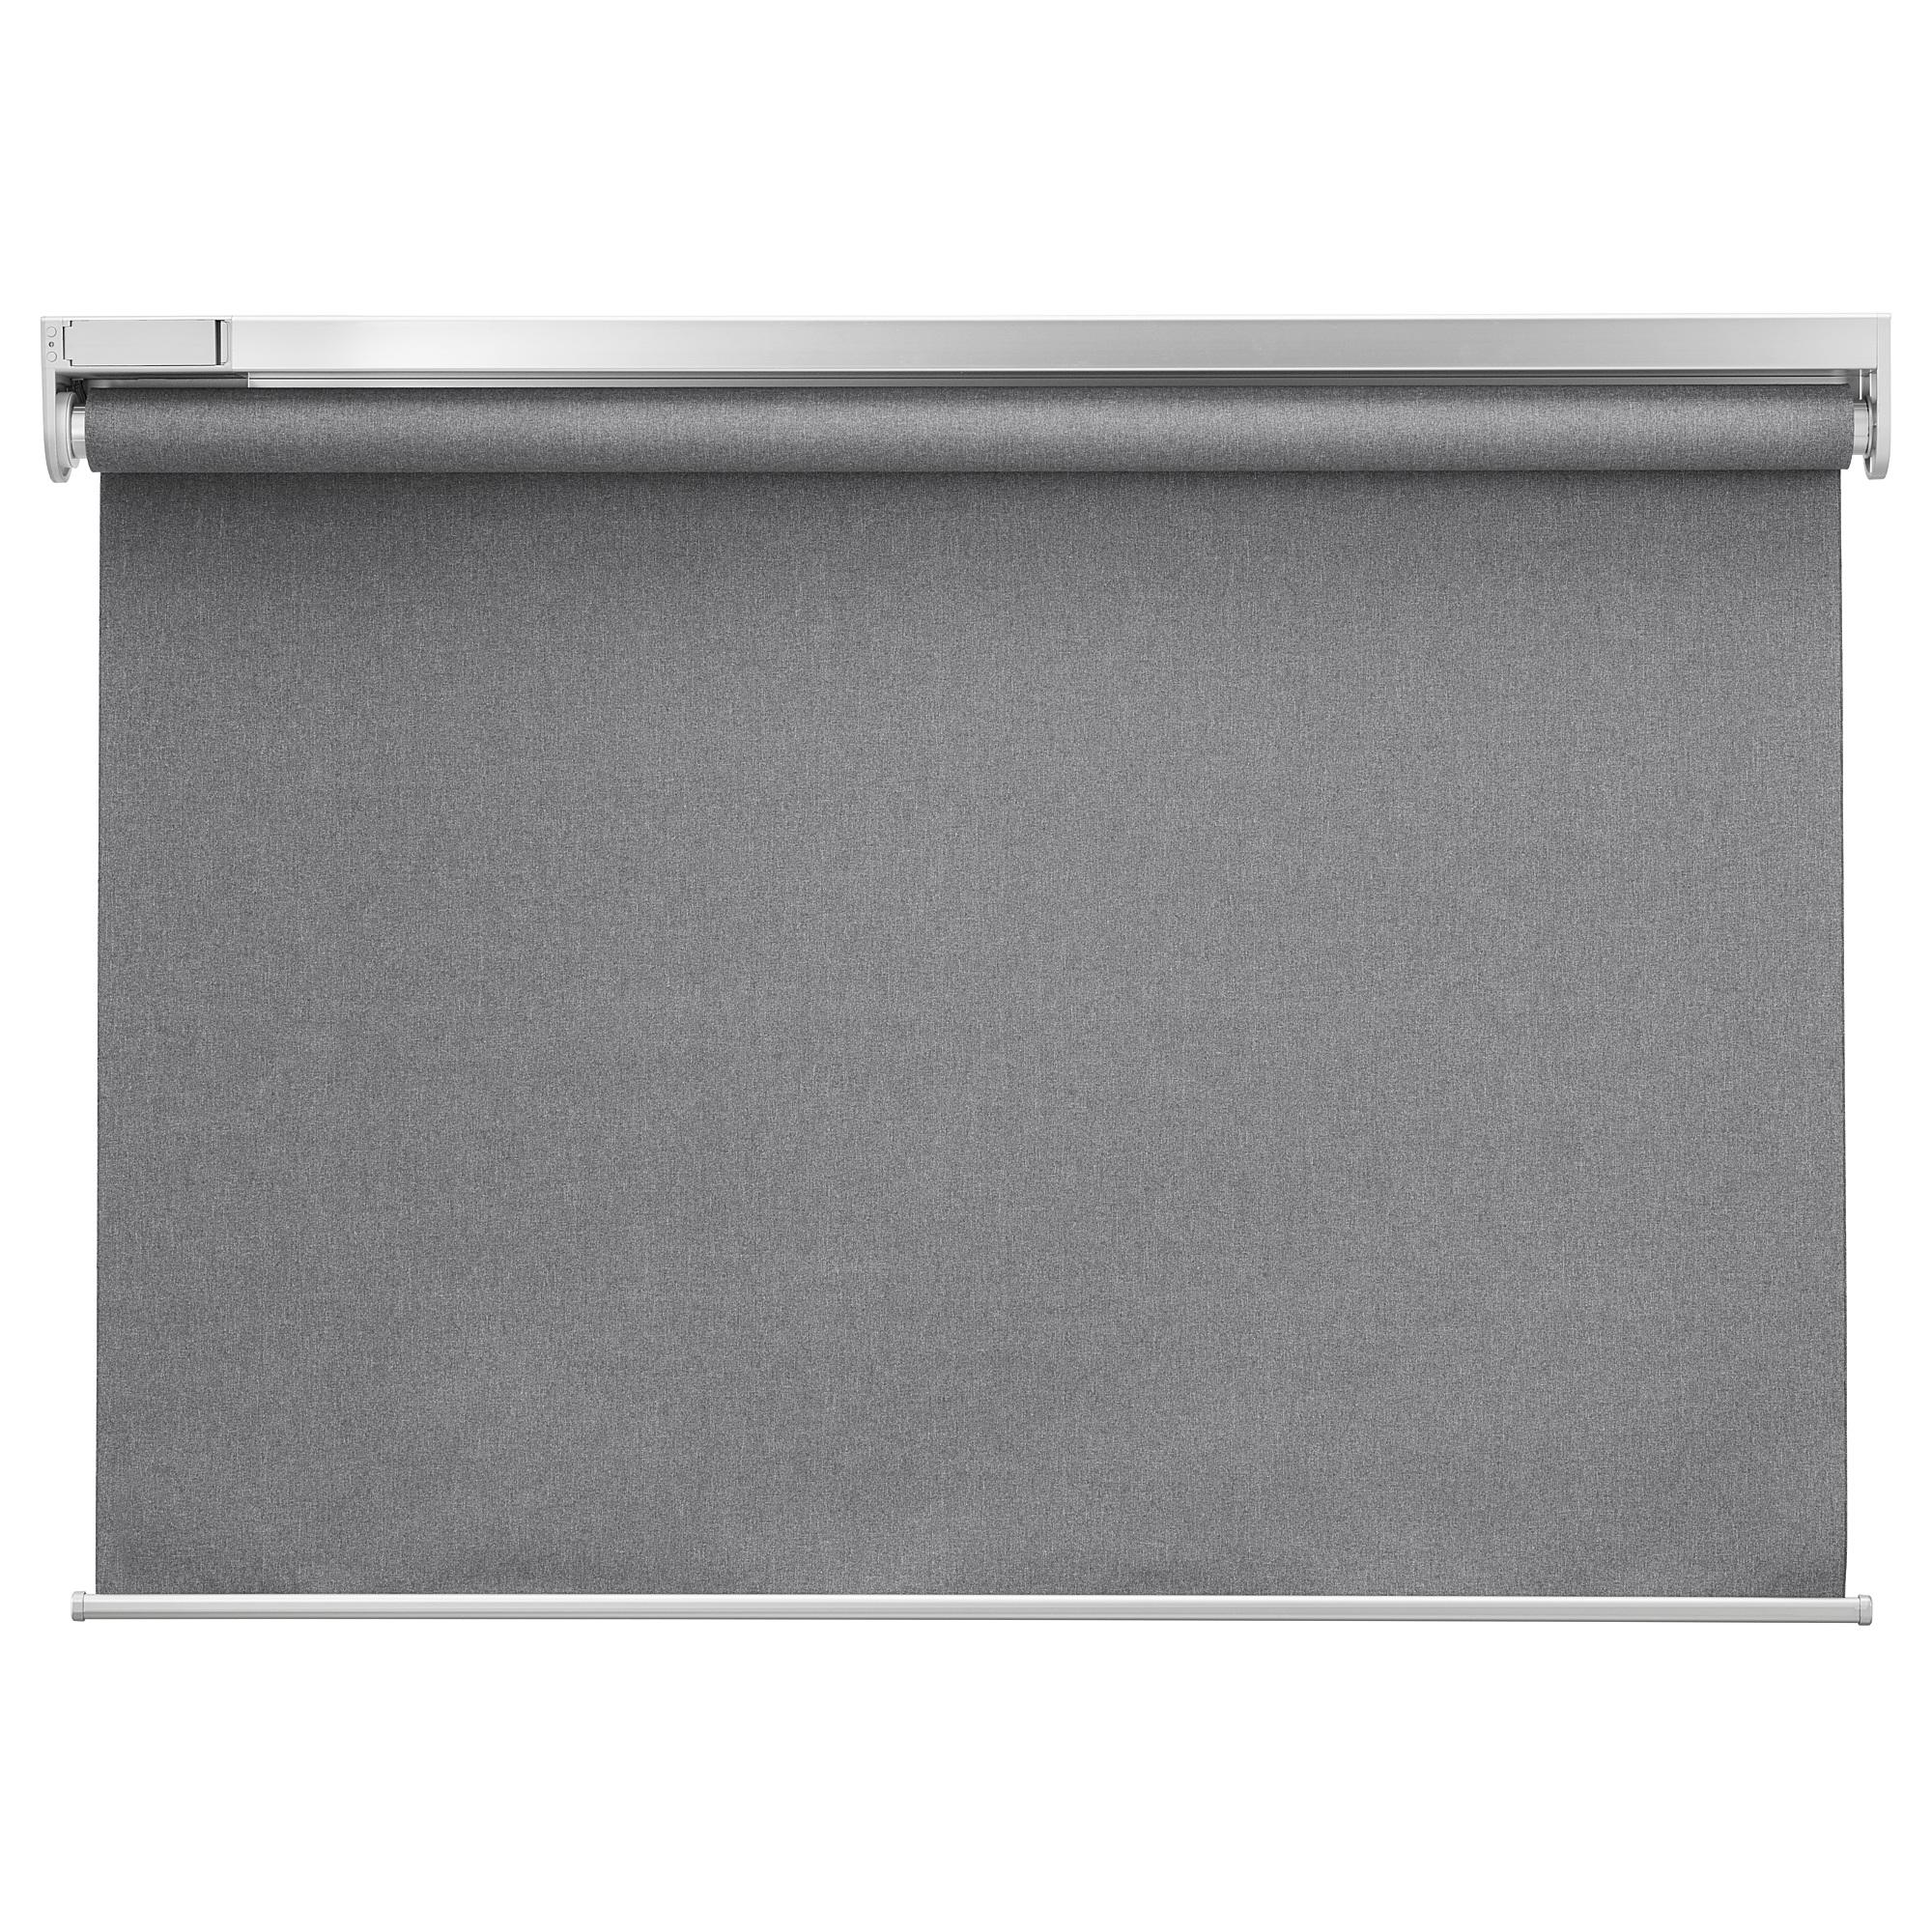 FYRTUR - 遮光捲軸簾, 140x195cm, 無線/電池操作 灰色 | IKEA 香港及澳門